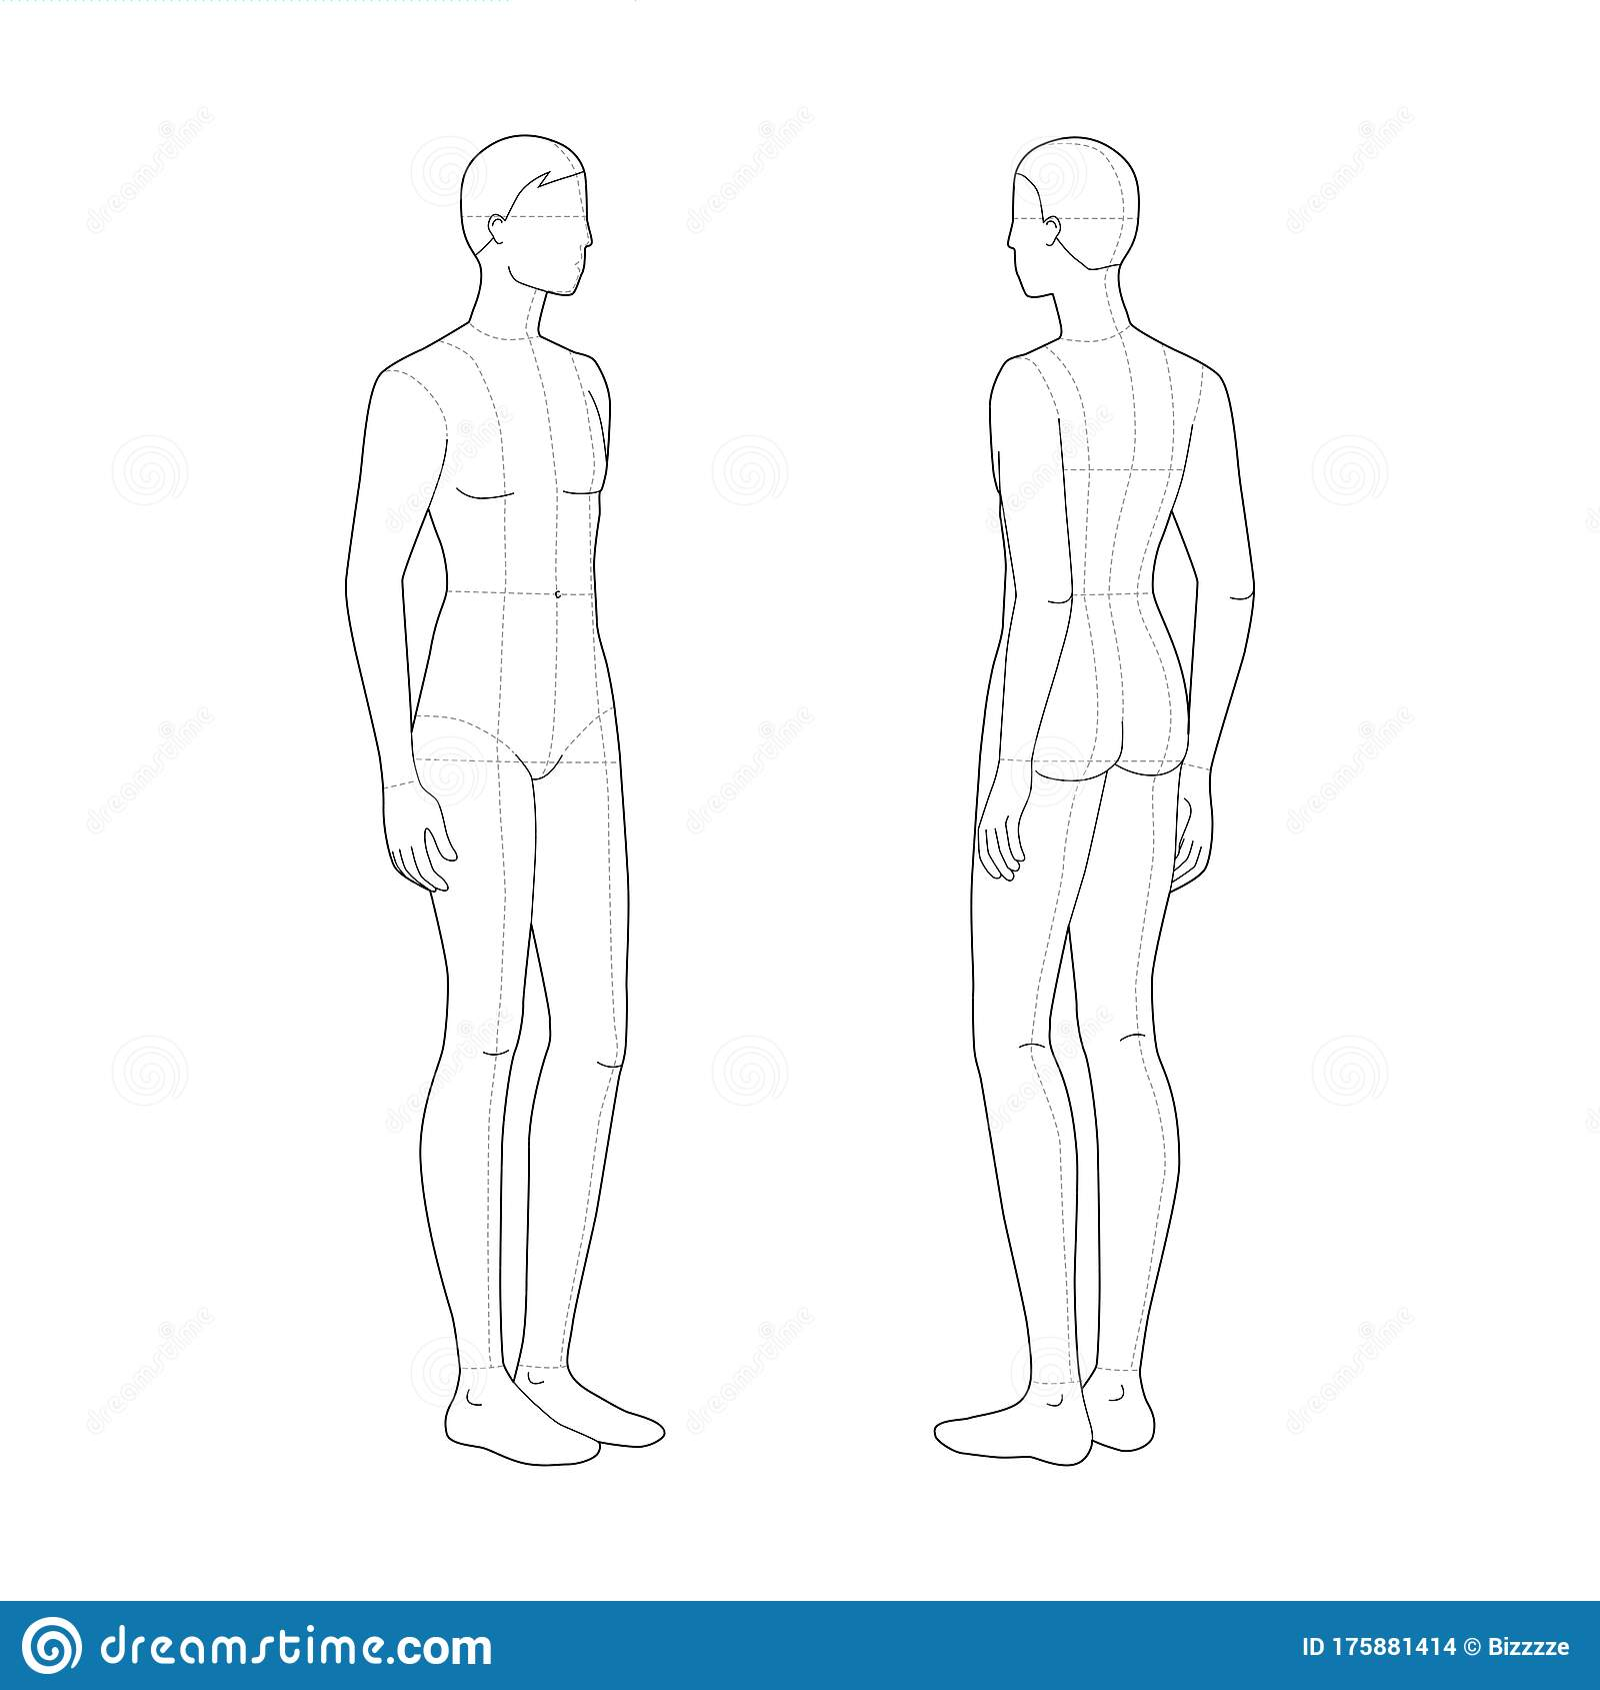 Fashion Template Of Standing Men Stock Vector Illustration Of Design Illustration 175881414